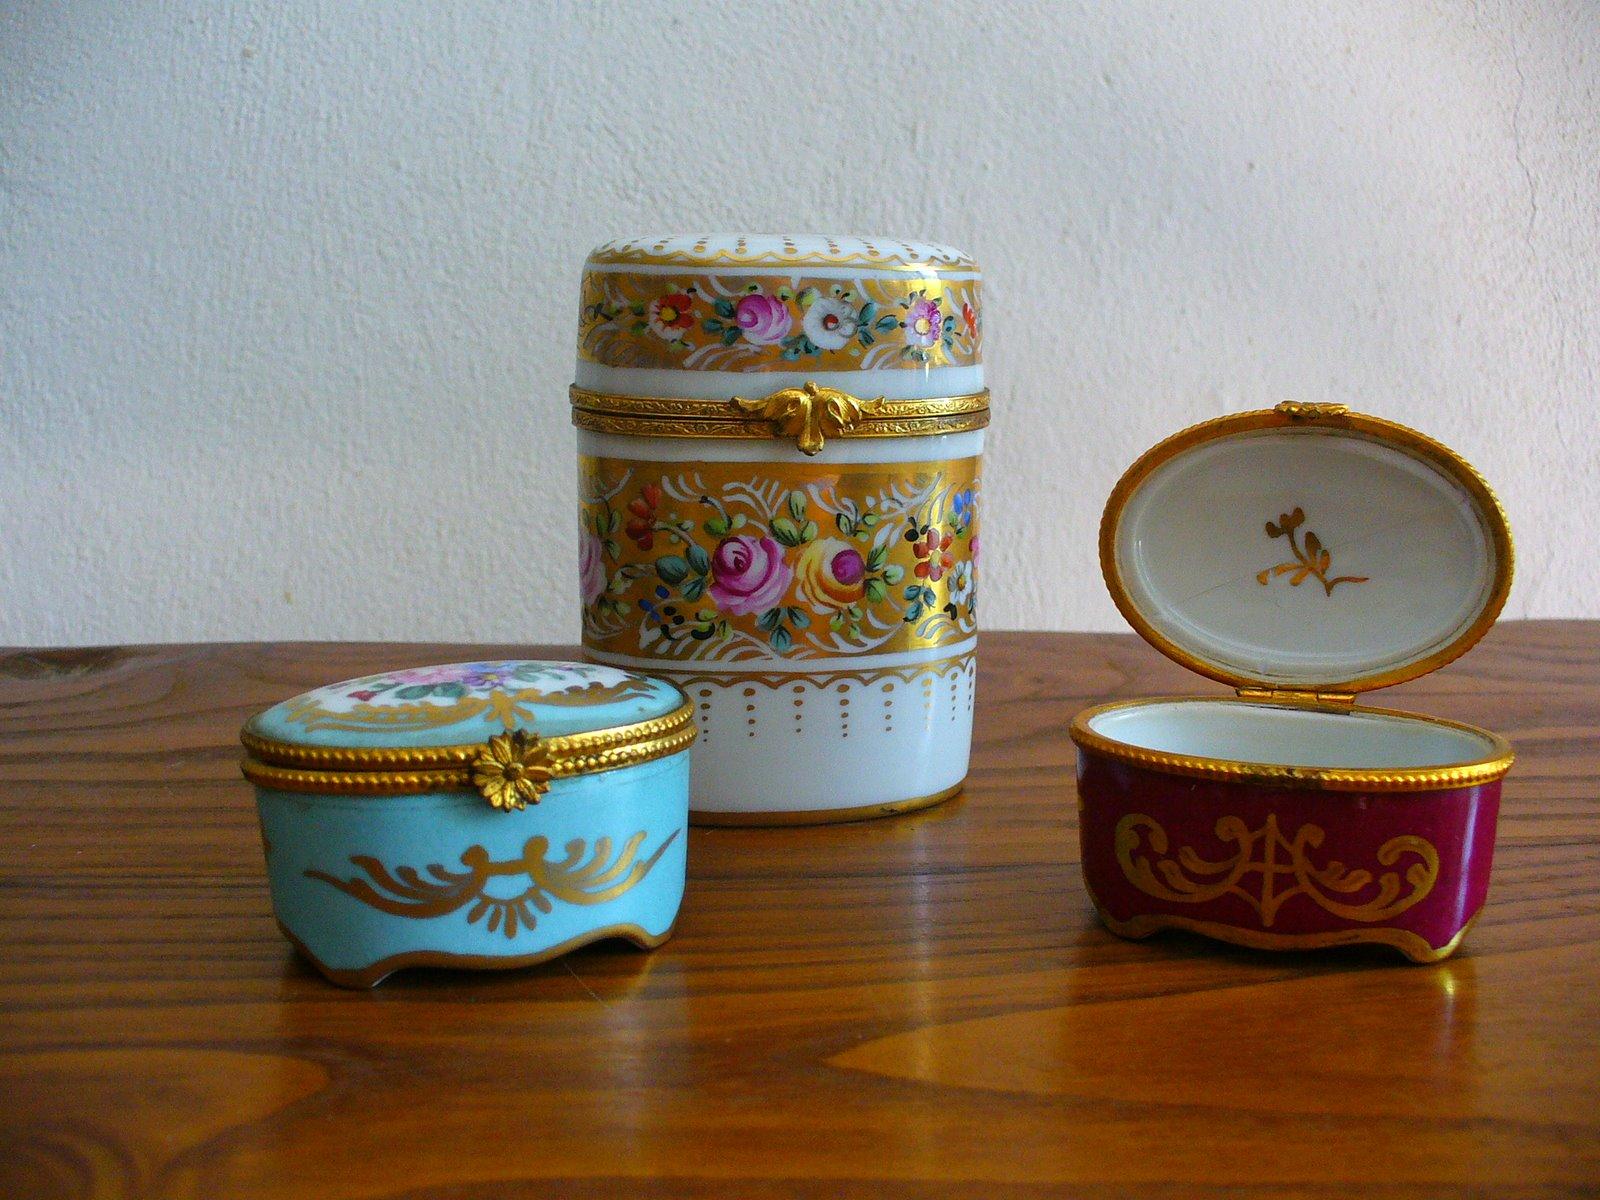 Marchi di porcellana di Limoges datati